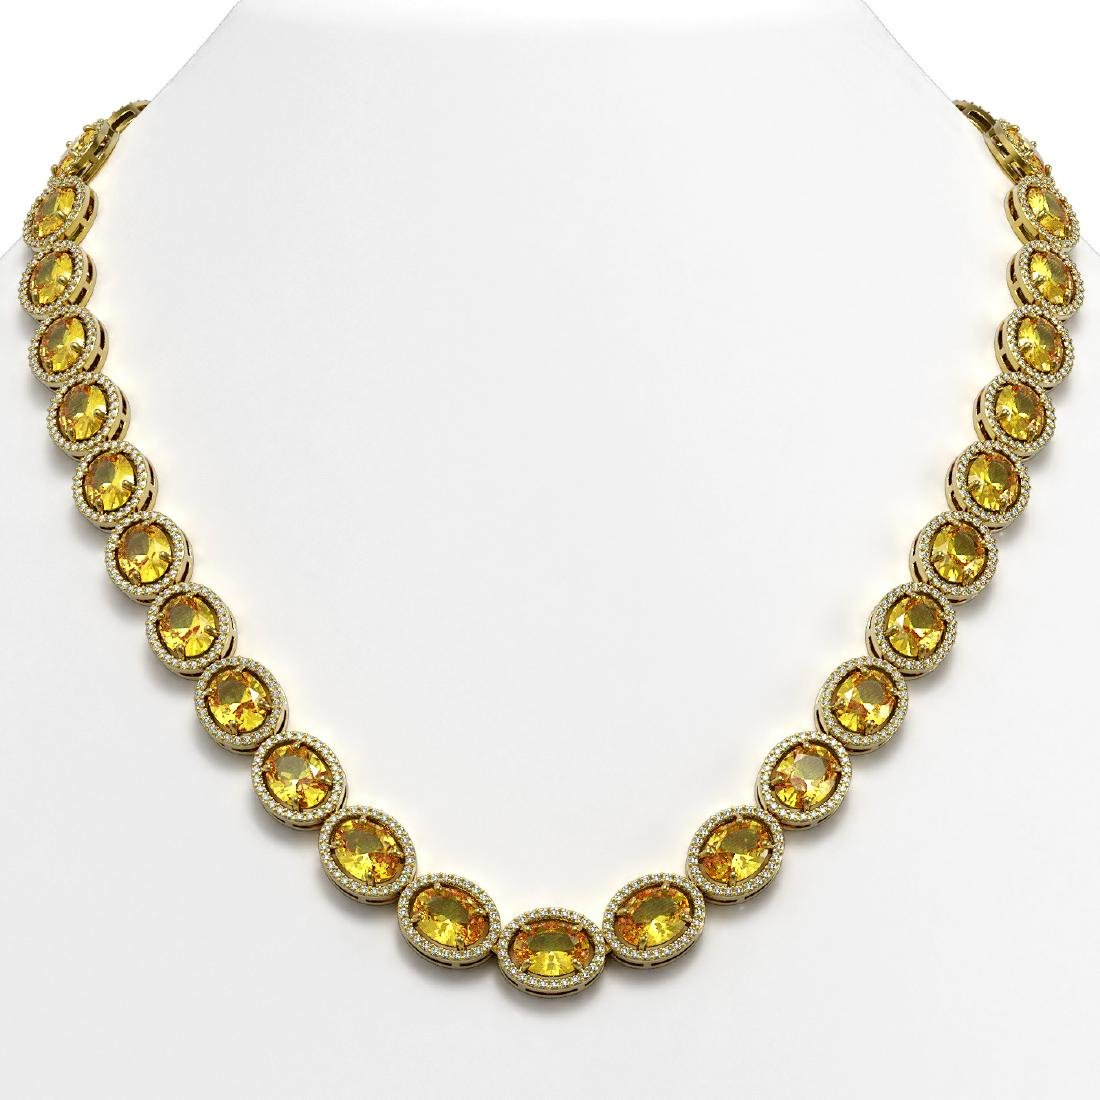 58.27 CTW Fancy Citrine & Diamond Halo Necklace 10K